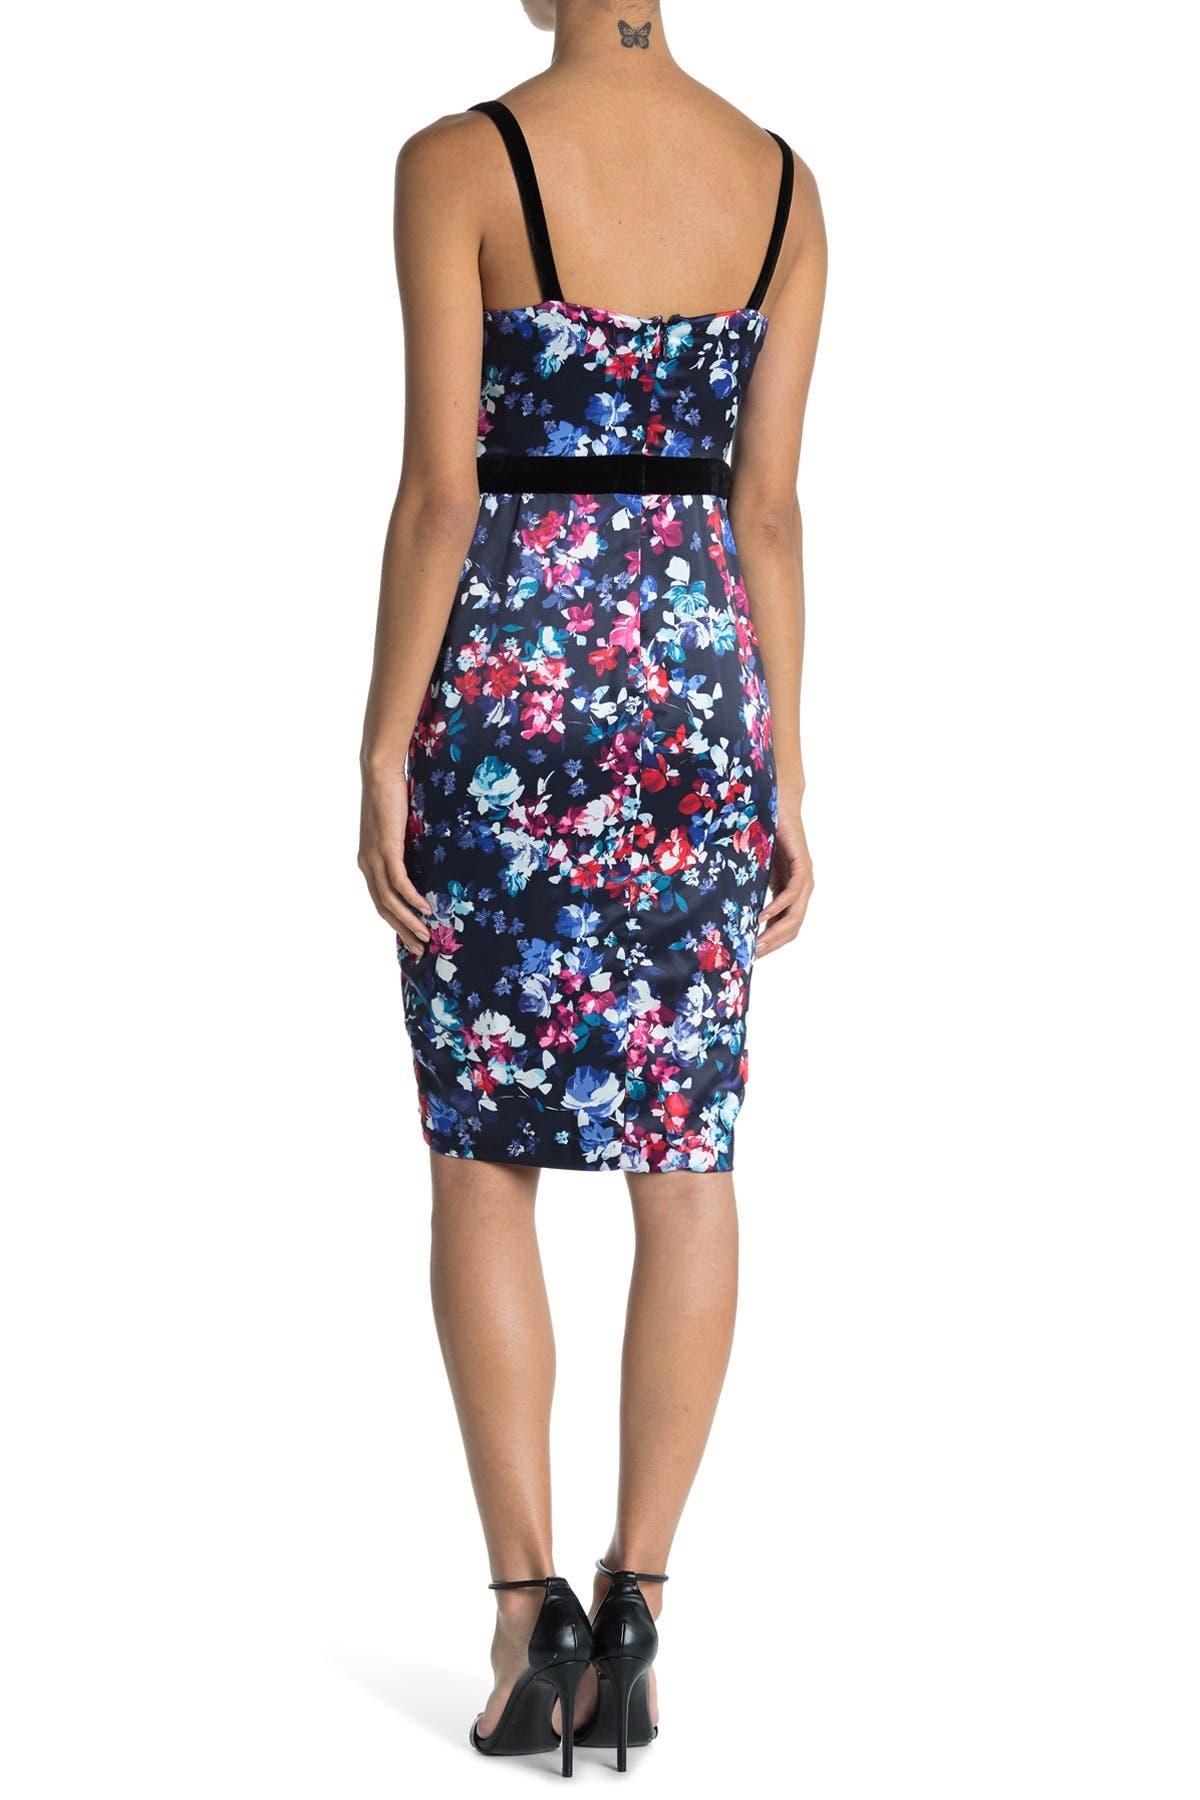 GUESS Floral Print Slip Dress